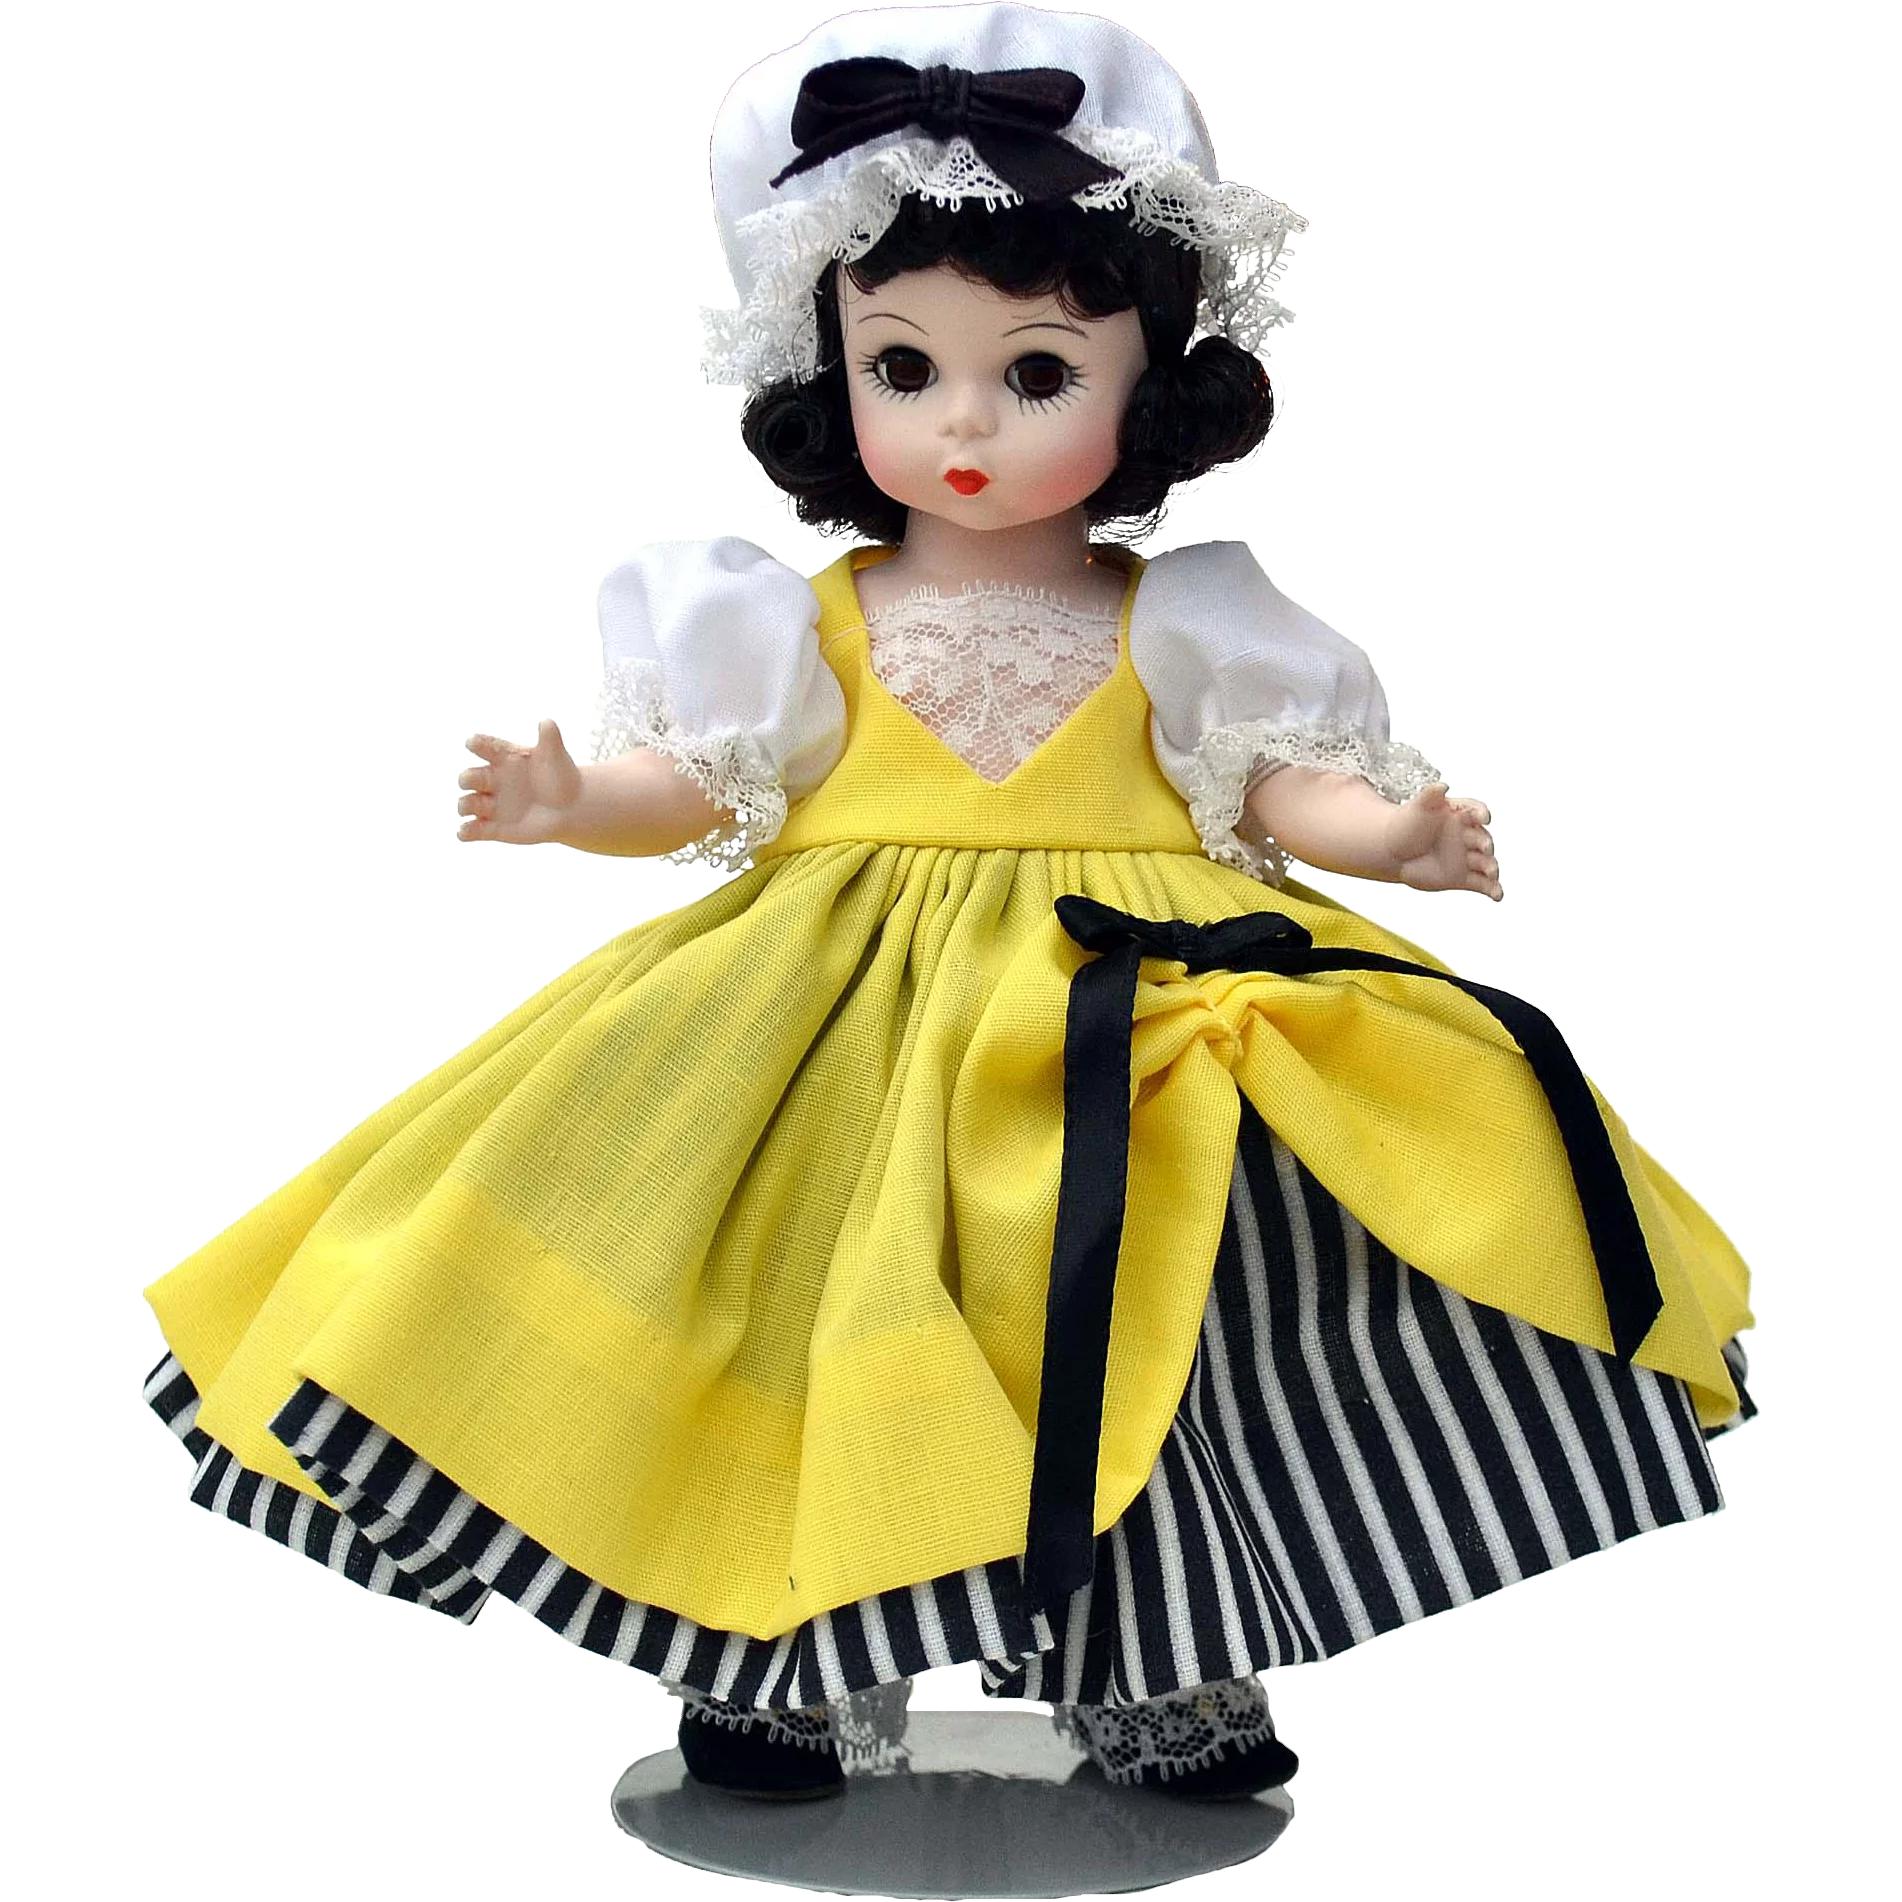 Vintage new in original box madame alexander pussycat doll